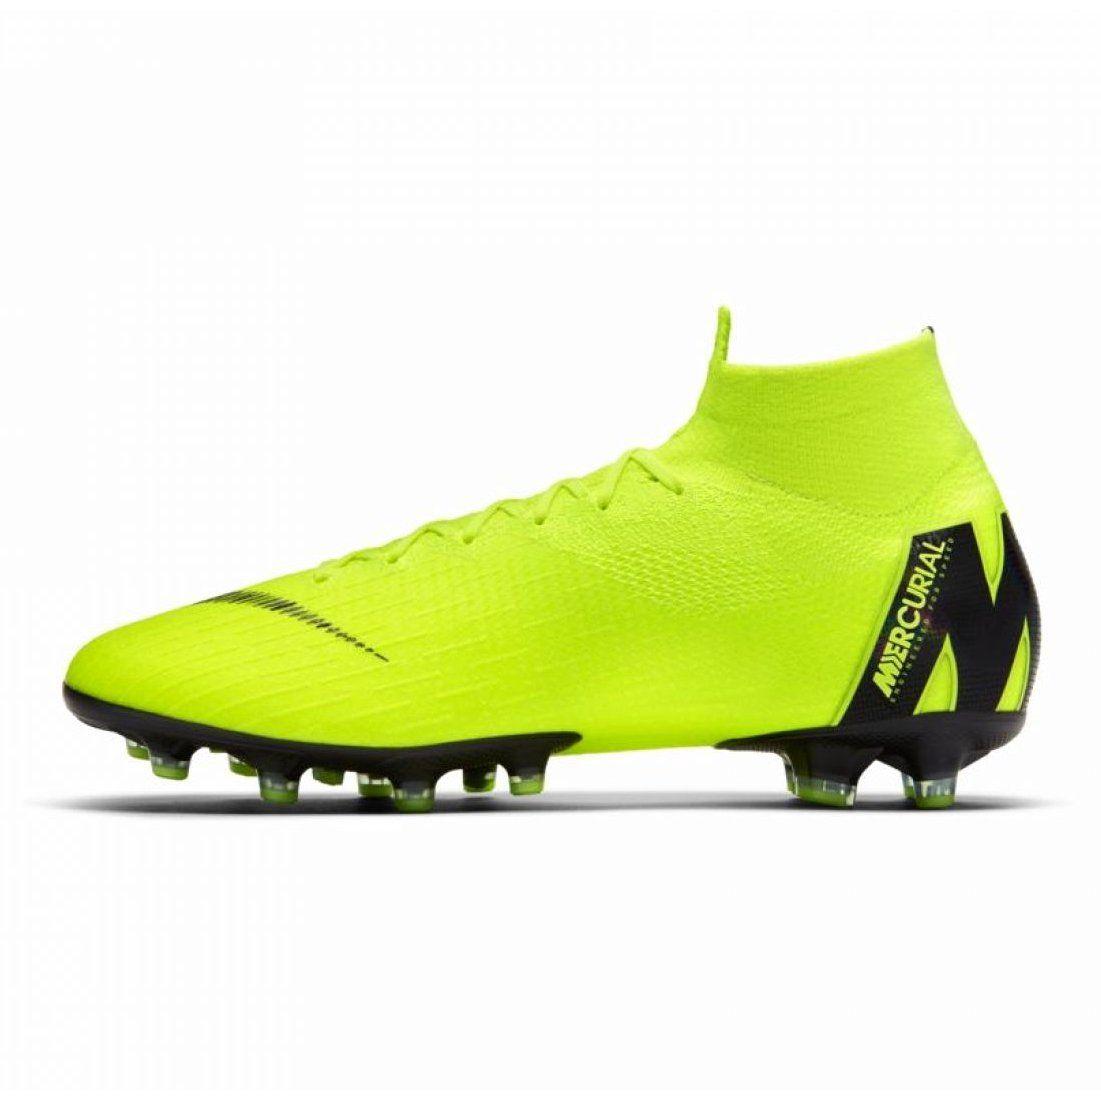 Korki Pilka Nozna Sport Nike Buty Pilkarskie Nike Mercurial Superfly 6 Elite Ag Pro M Ah7377 701 Football Boots Superfly Boots